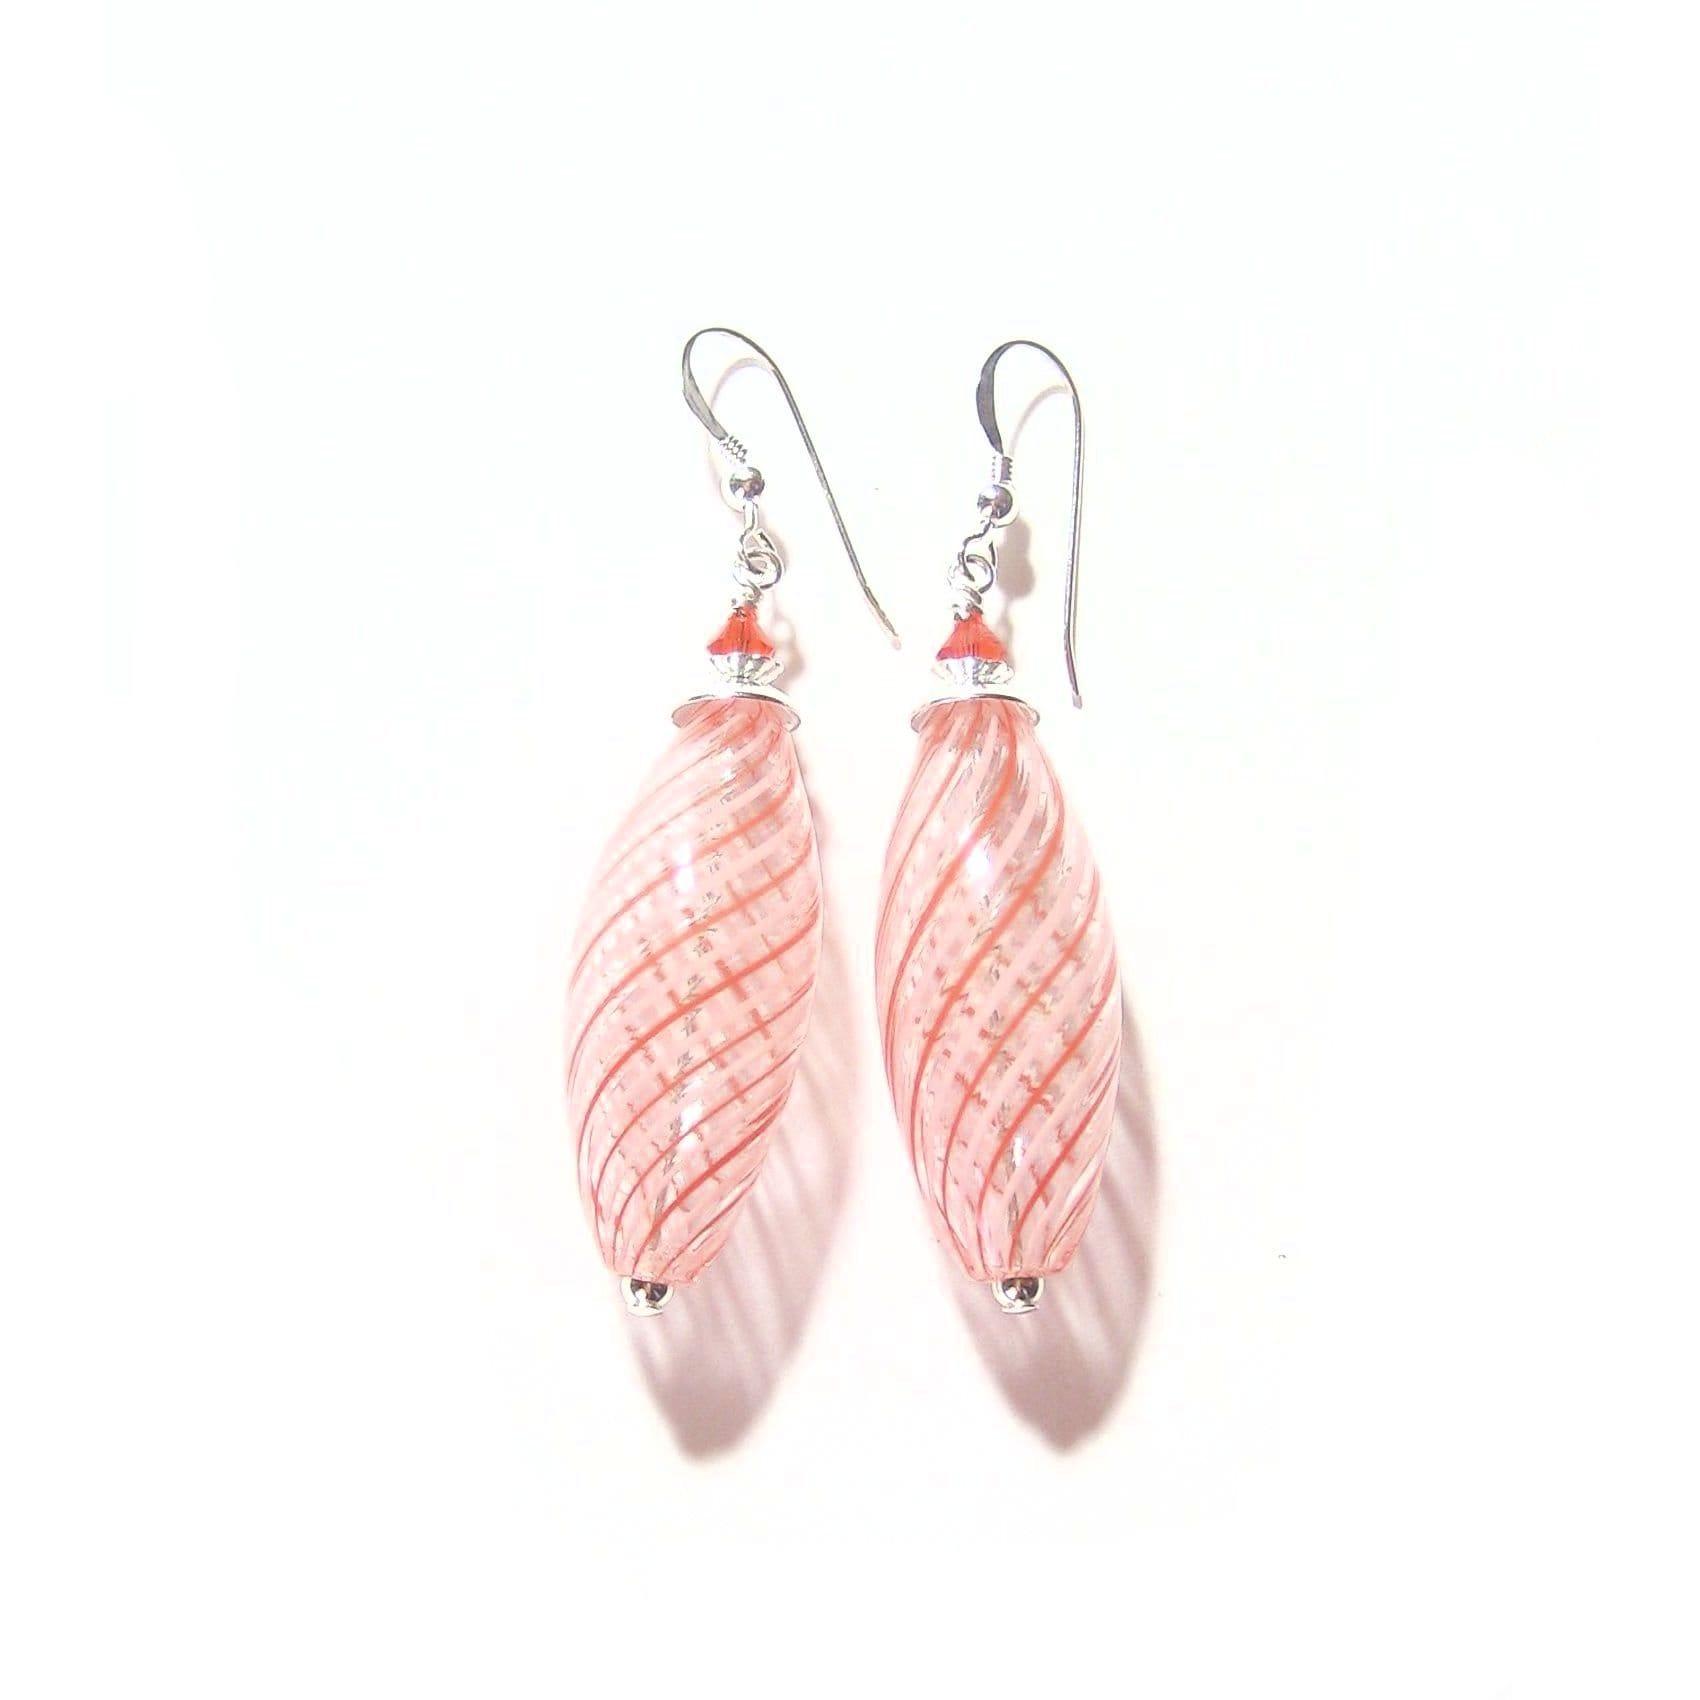 Hooks In Display Gift Box Long Beautiful Murano Glass Earrings 3.5 Cm